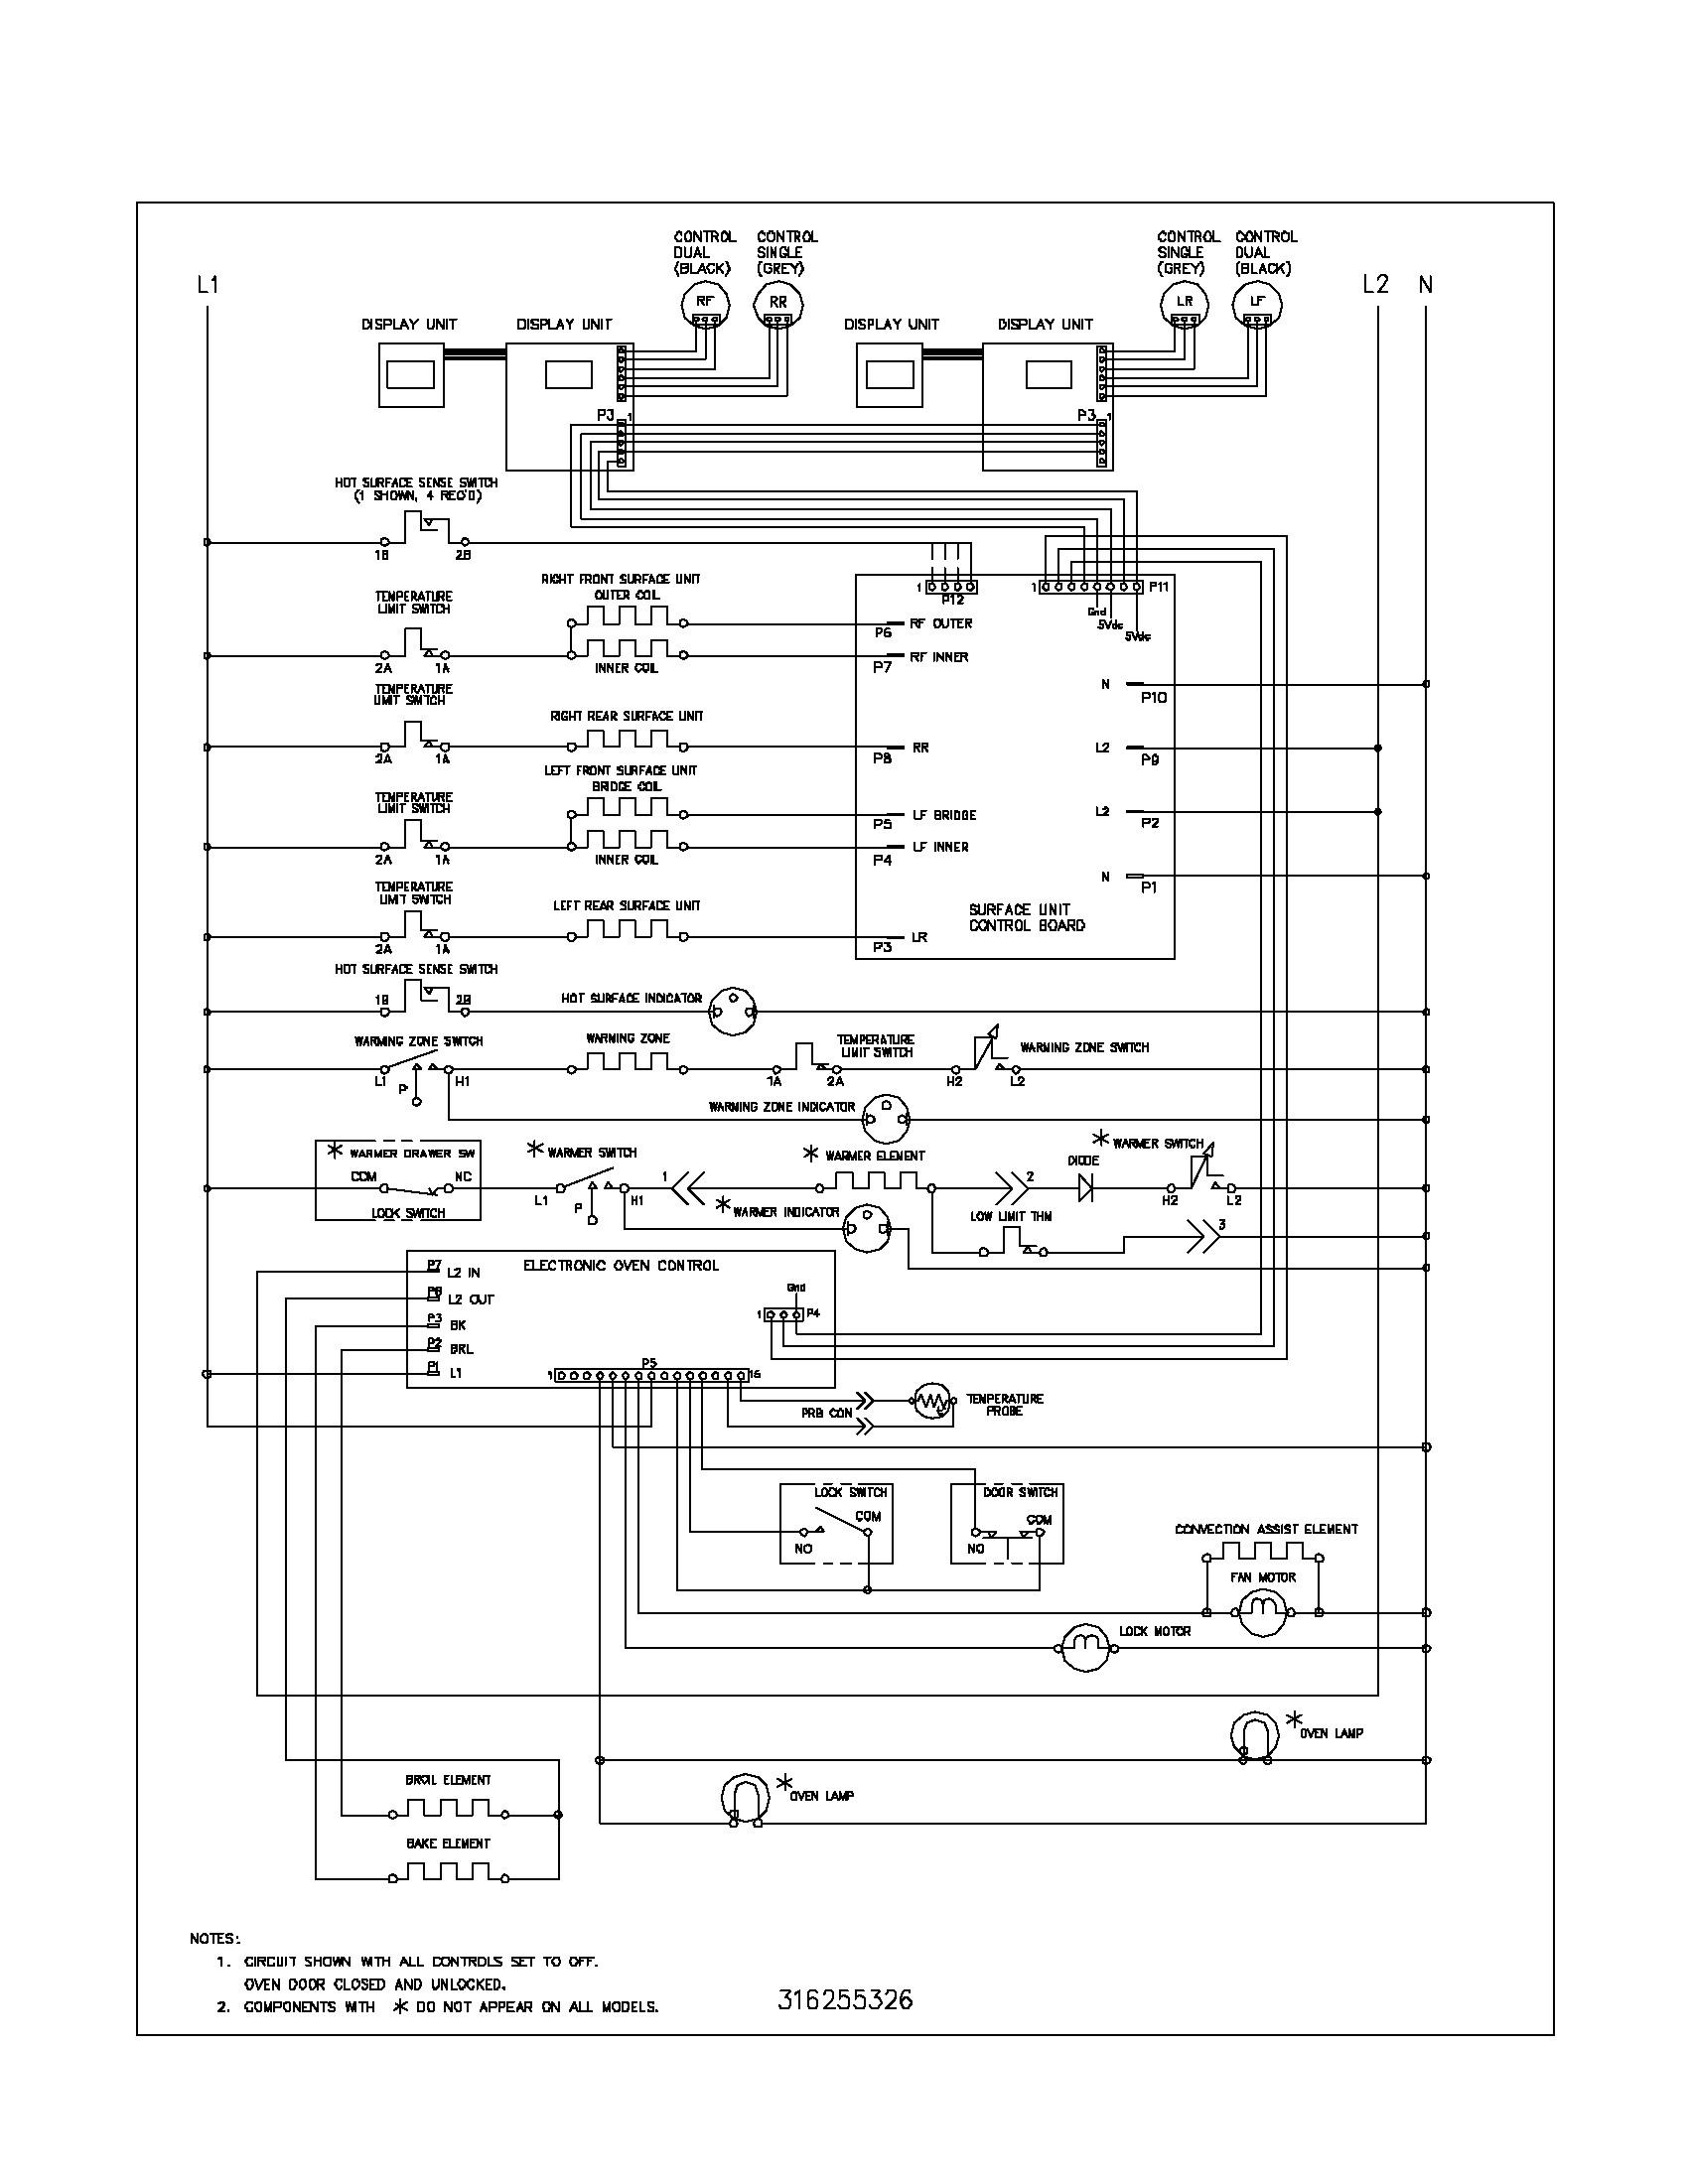 MA_1381] Furnace Blower Motor Wiring Diagram Wagner Furnace Circuit  Diagrams Free DiagramMarki Viewor Mohammedshrine Librar Wiring 101